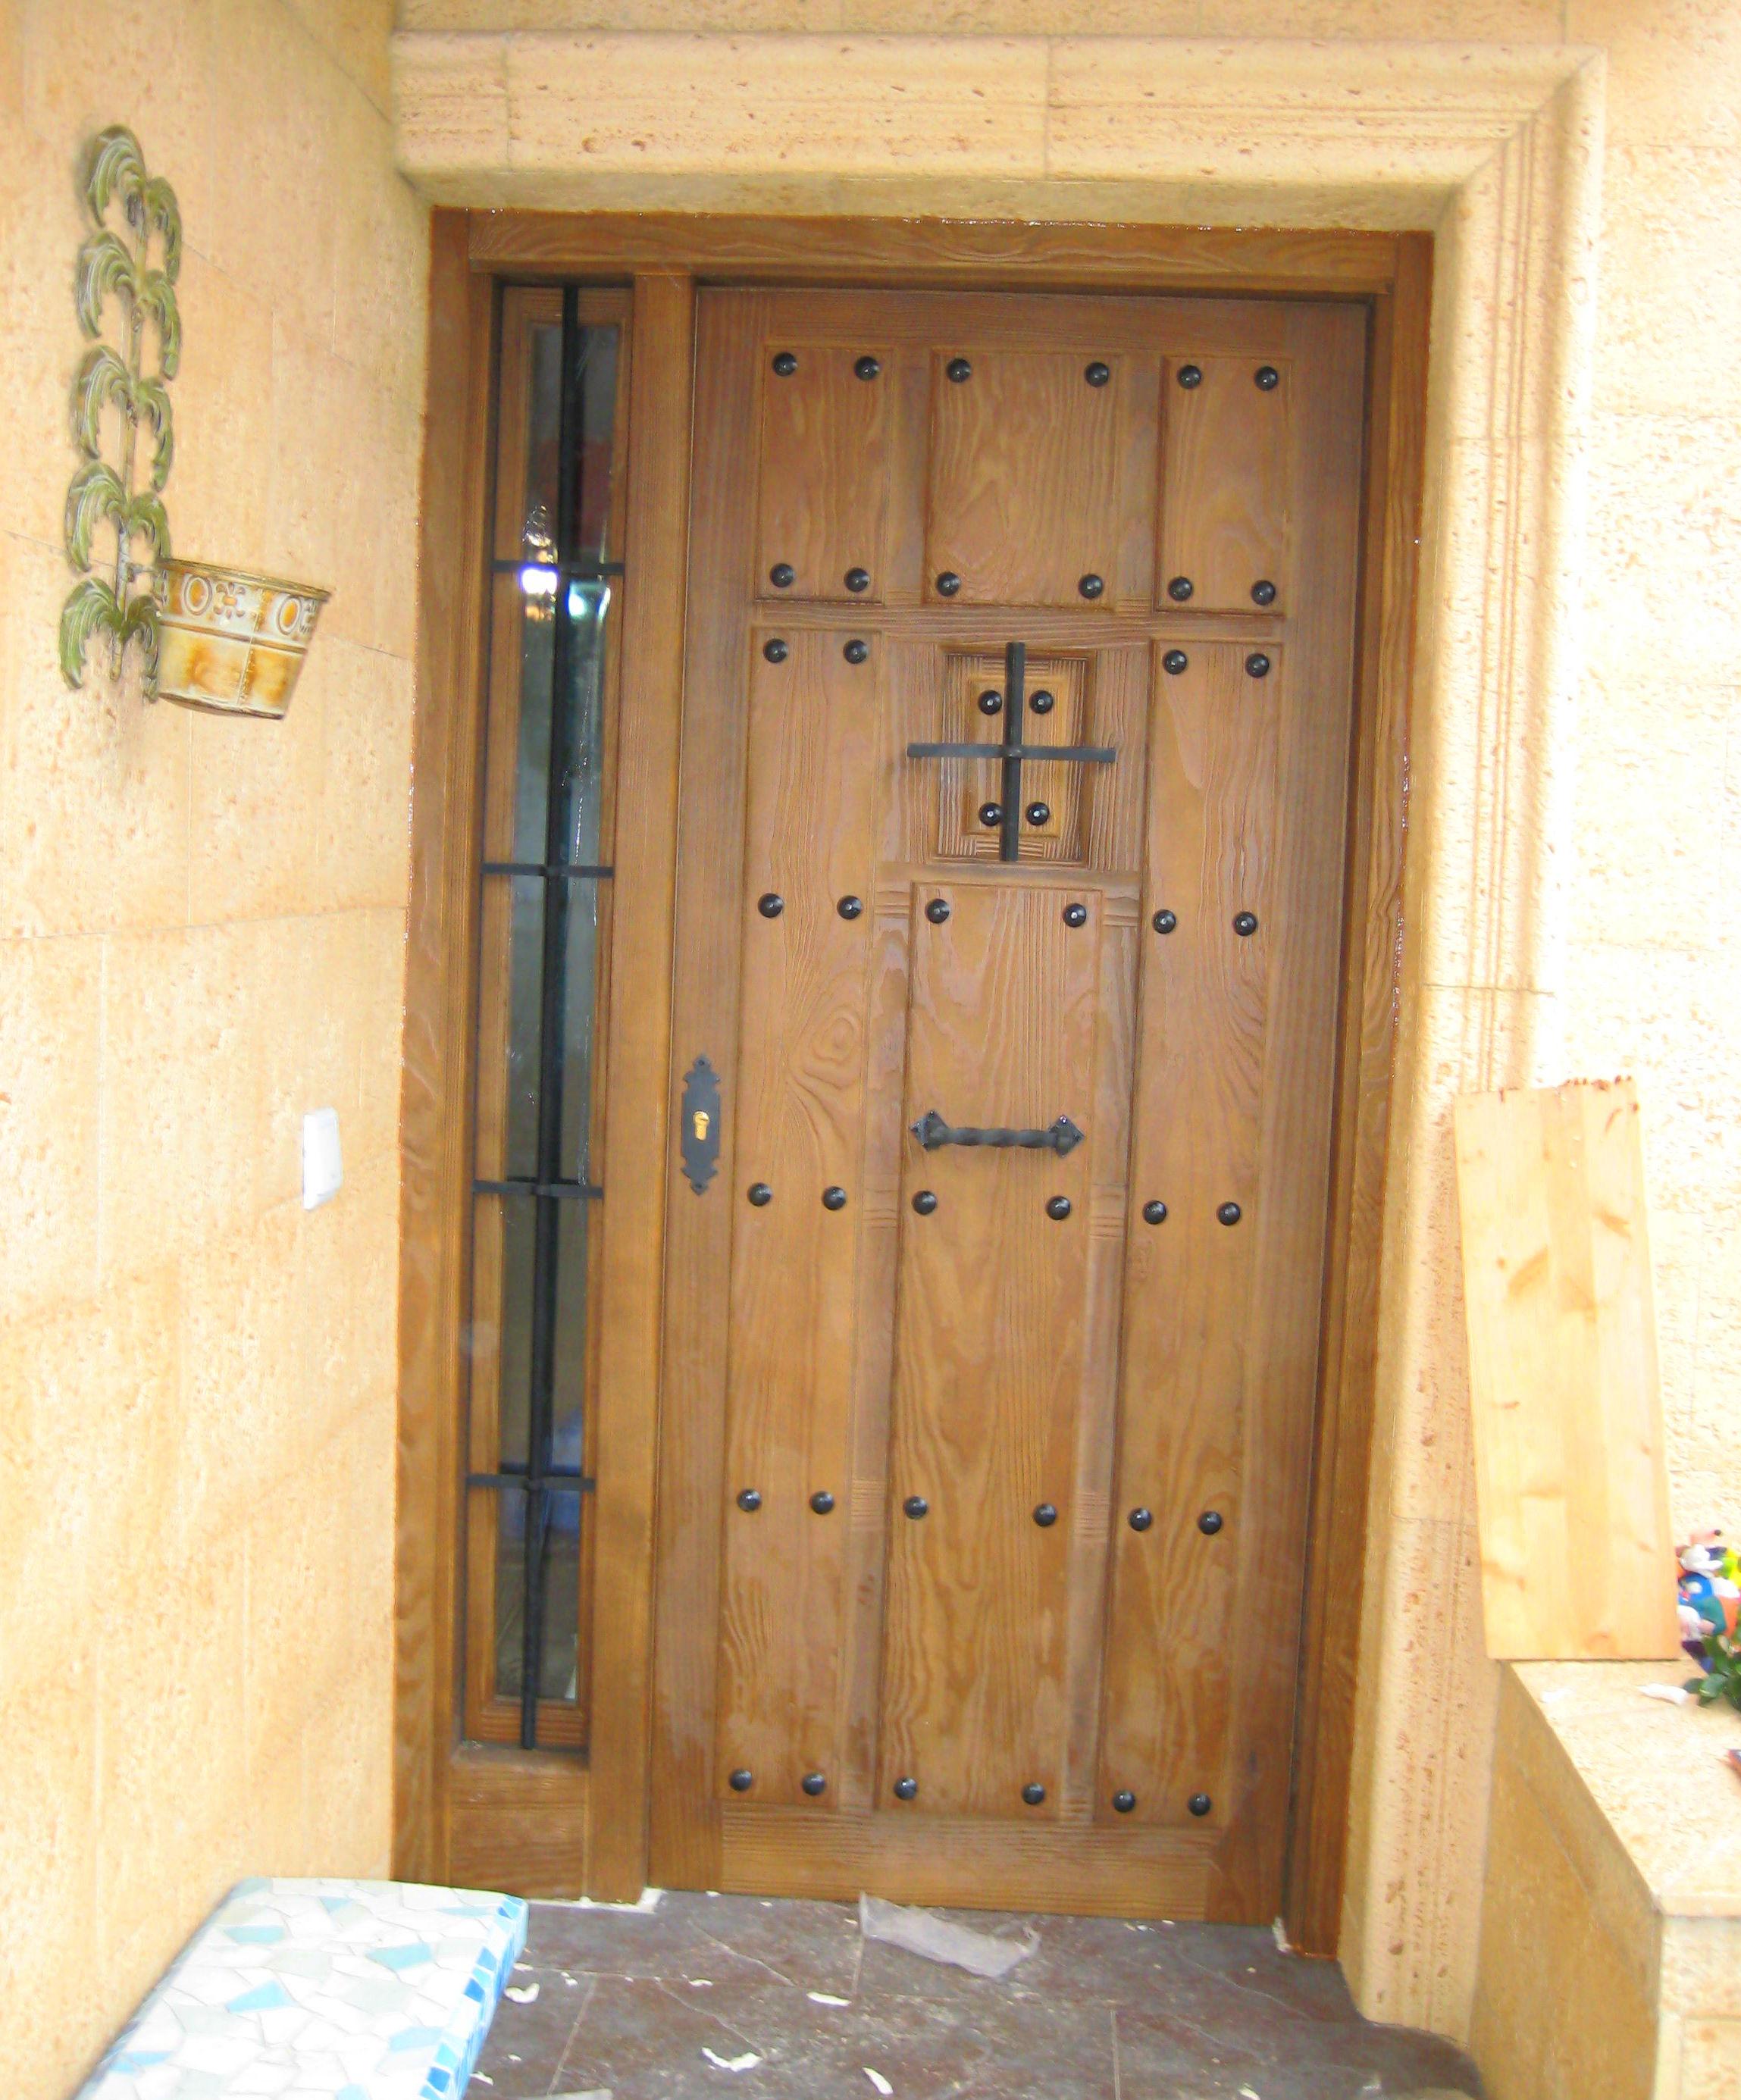 Puertas de entrada de madera maciza cat logo de productos for Puertas de entrada de madera maciza